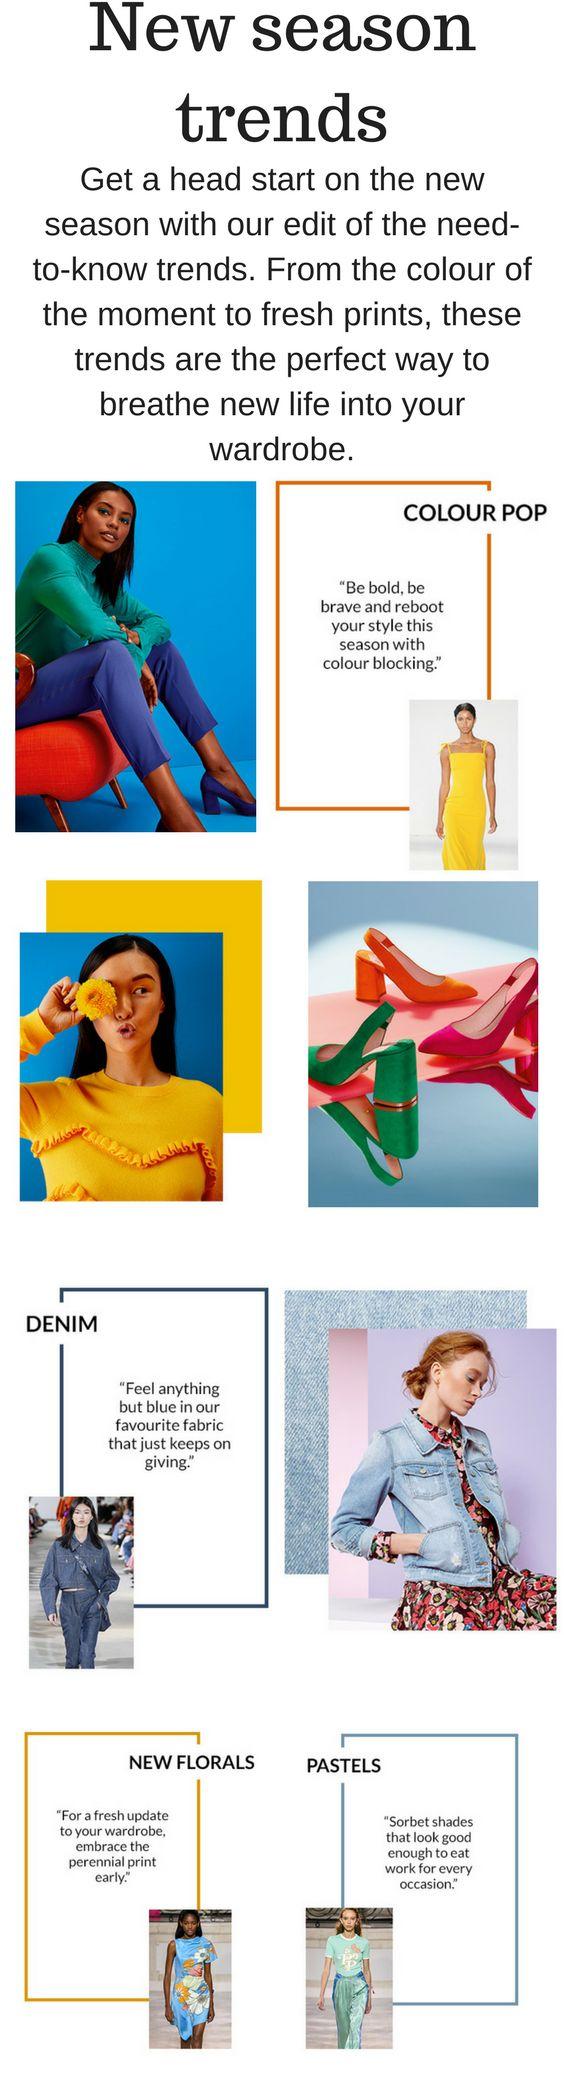 New Season Trends / Trending Fashion / Women's Fashion / Florals / Denim / Bold Colors / #Womensfashion #trendingnow #trending #stylechallenge #newarrivals #new